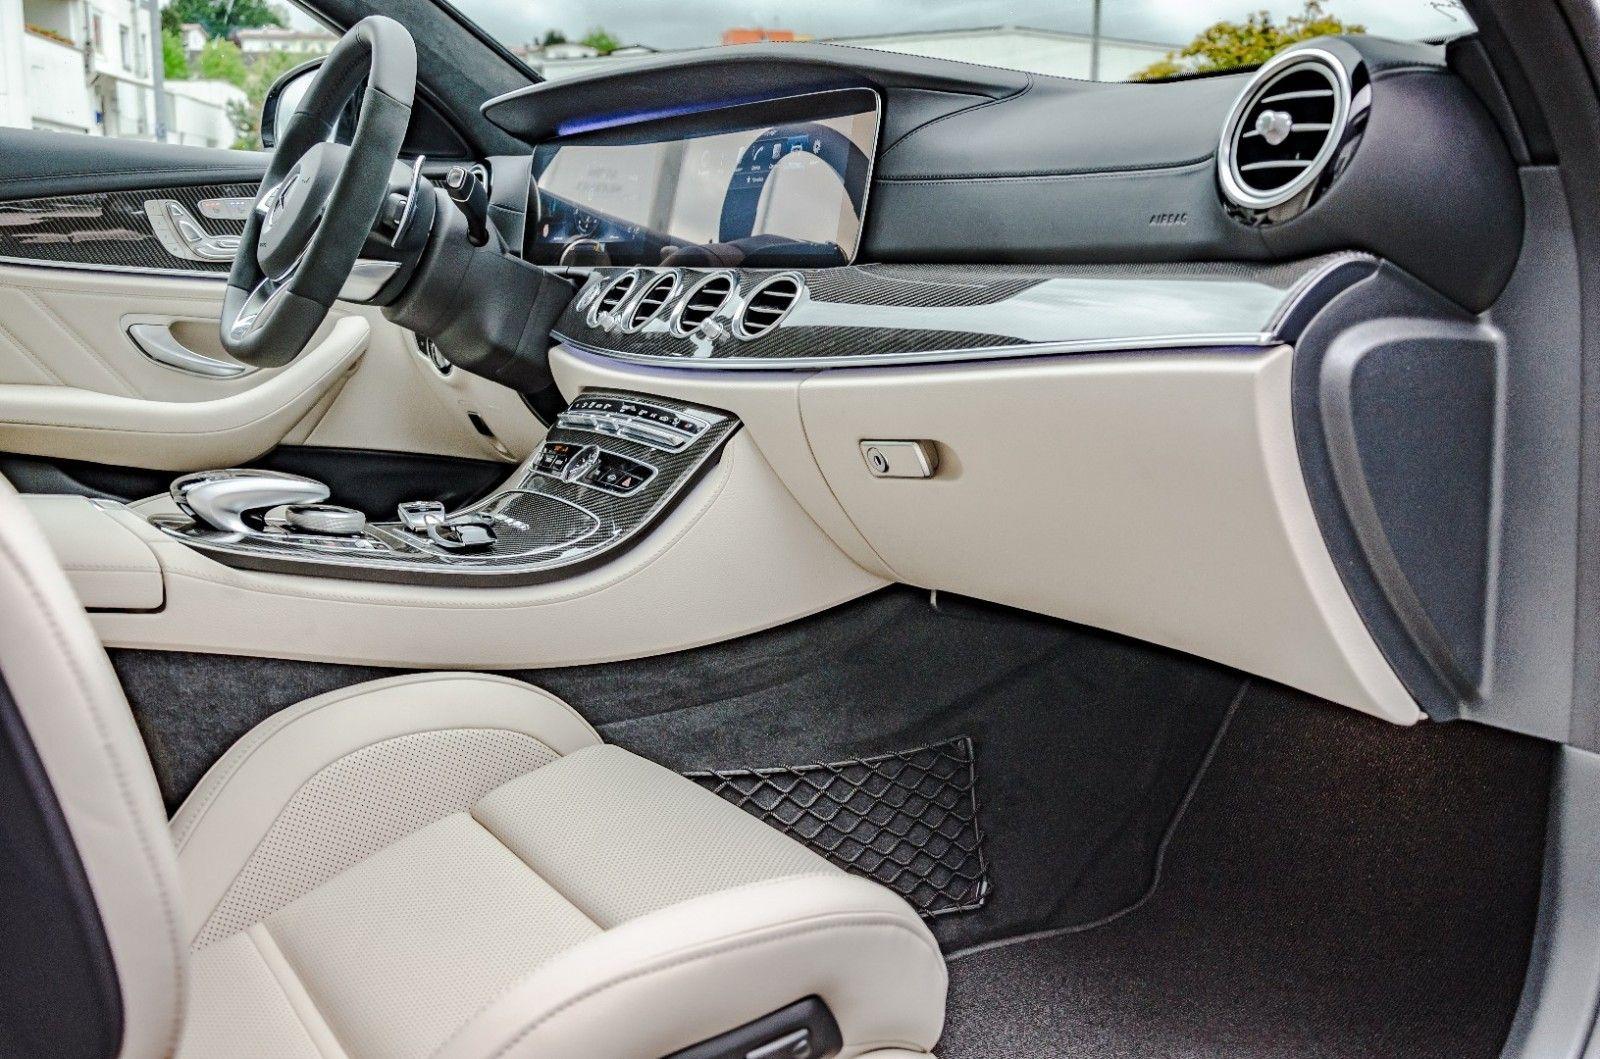 Mercedes Benz E 63 Amg S 4m Brabus Perform Seats Carbon Burmester Export Price 148 750 Stosk 1478 Fuel Consumptio Mercedes Benz Benz Mercedes